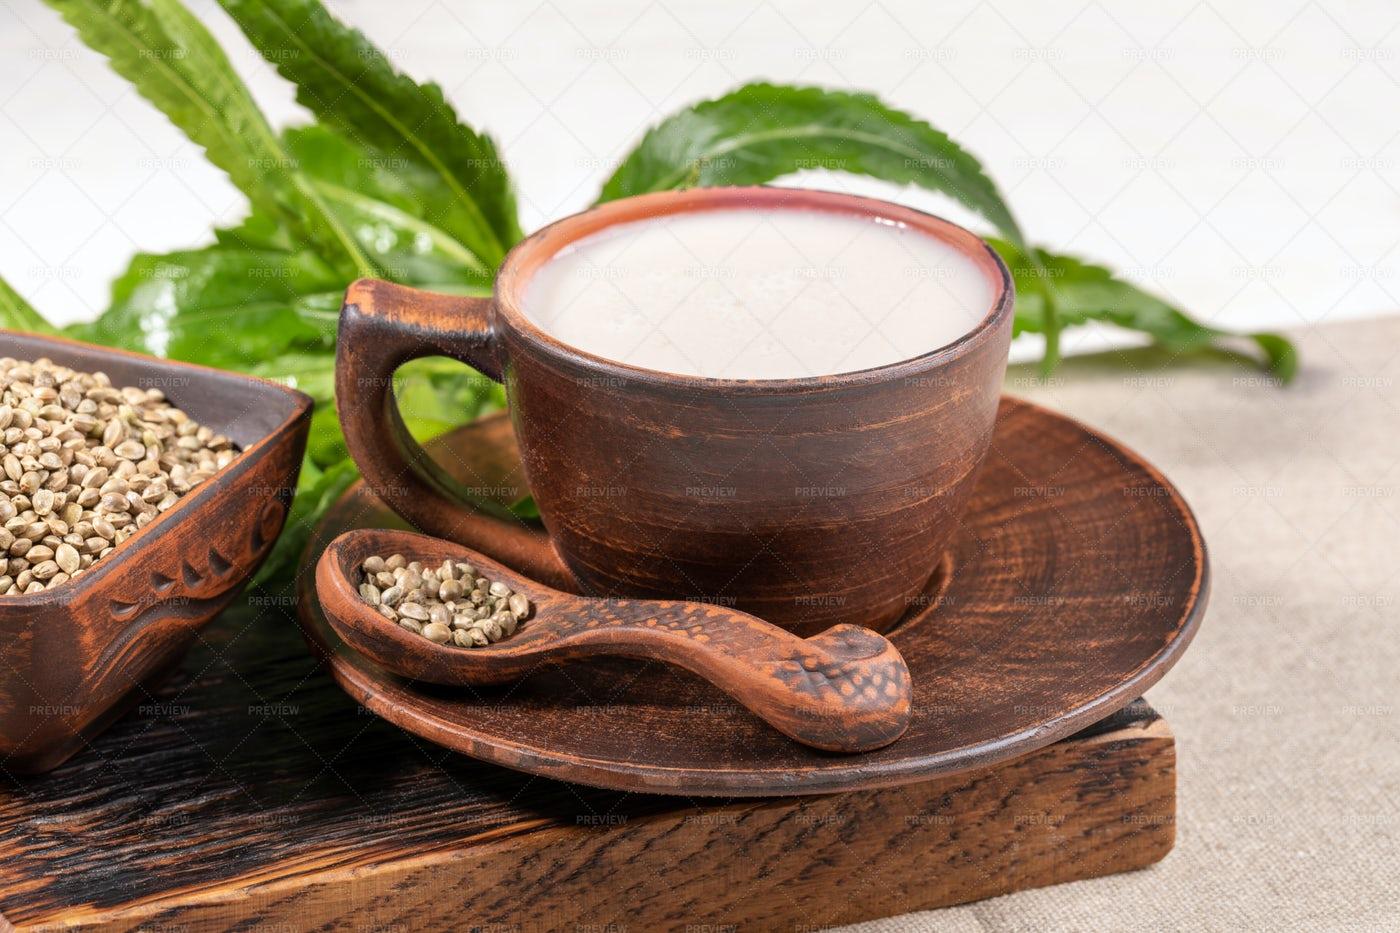 Hemp Milk In A Ceramic Cup: Stock Photos